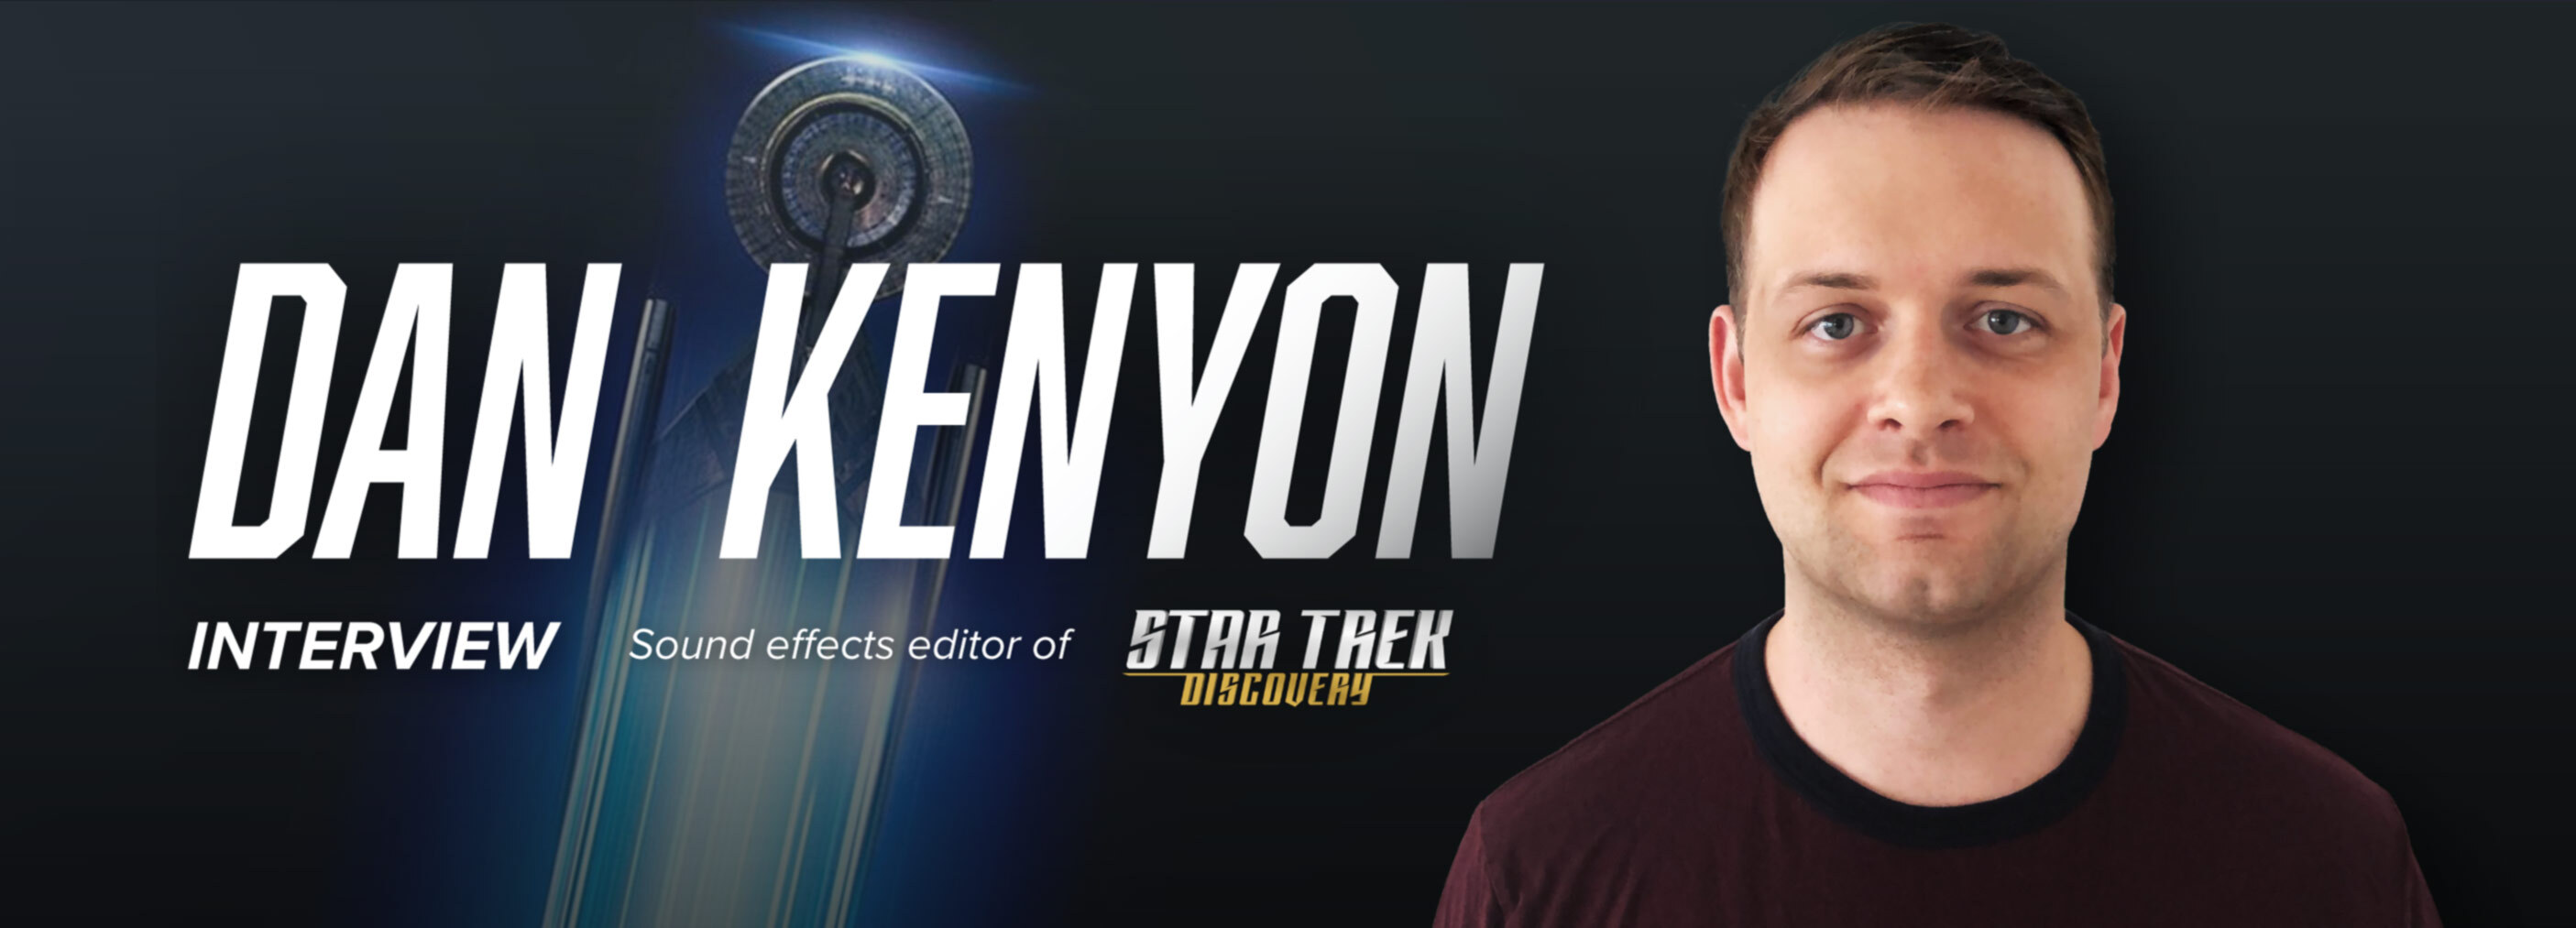 dan-kenyon-interview-banner